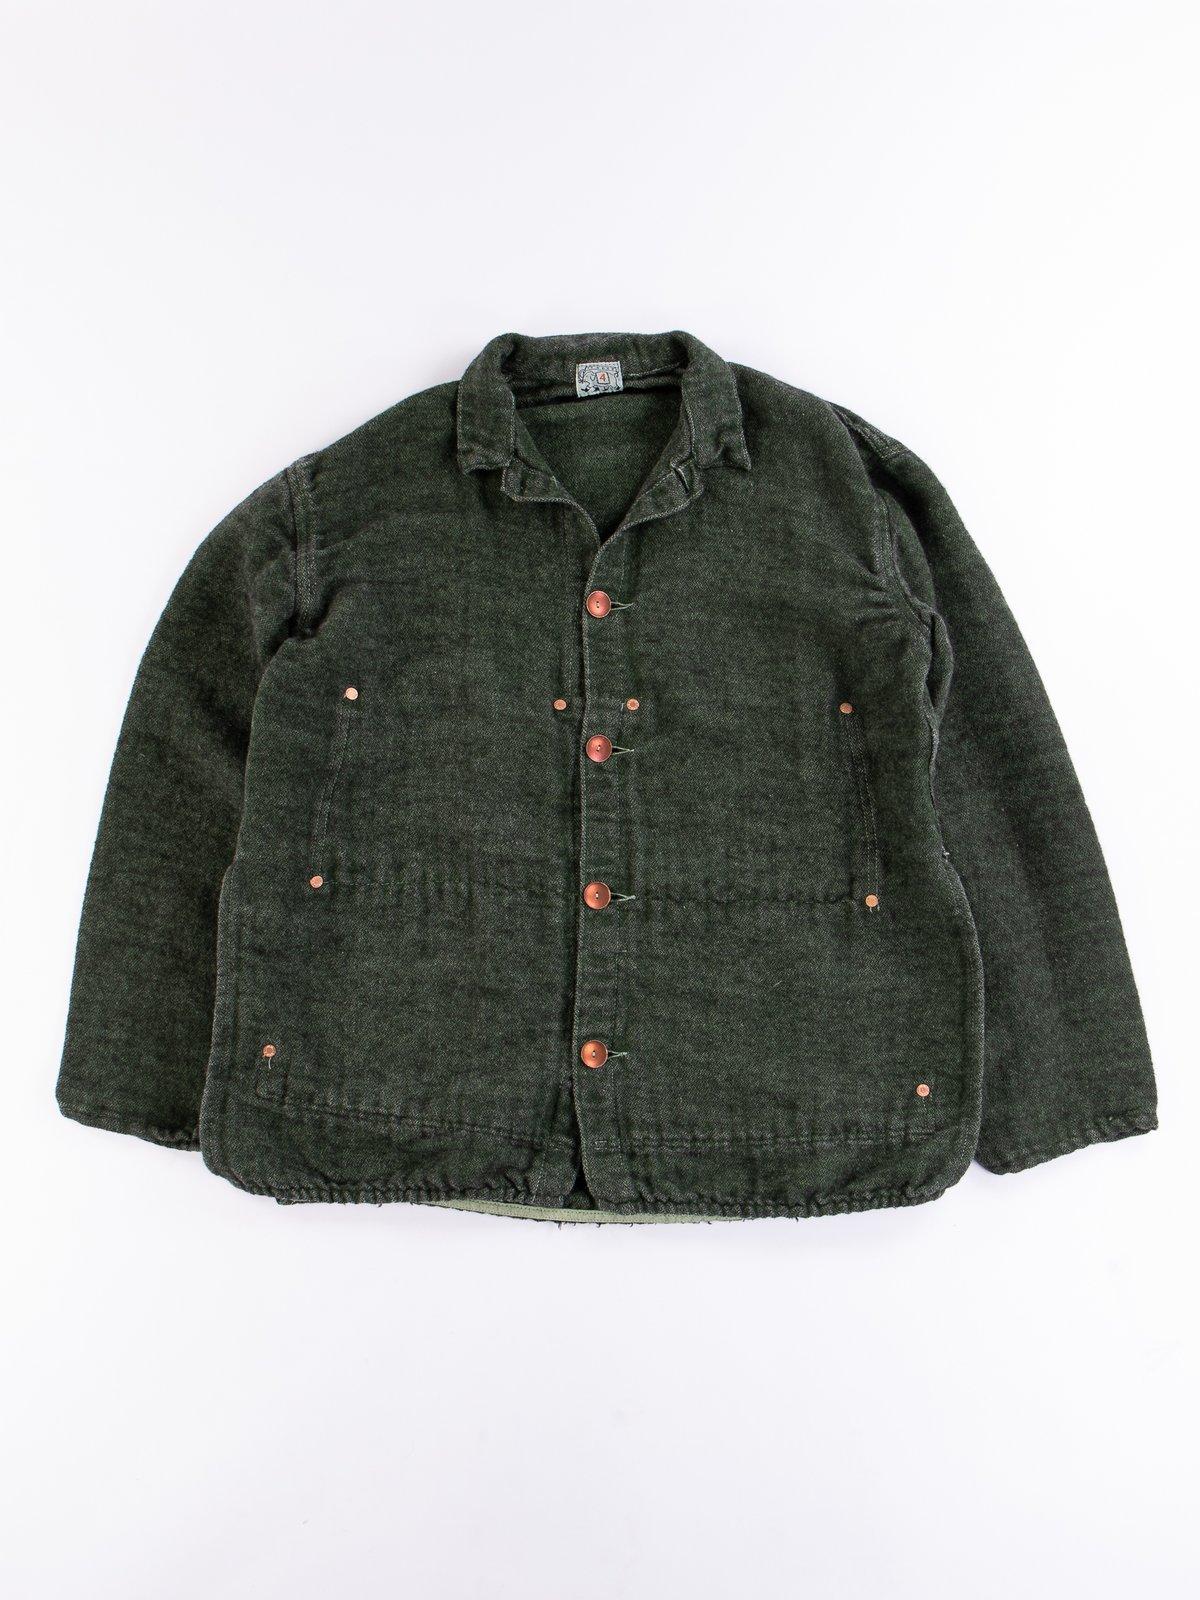 Viridian/Black Cotton/Mohair Janus Jacket - Image 1